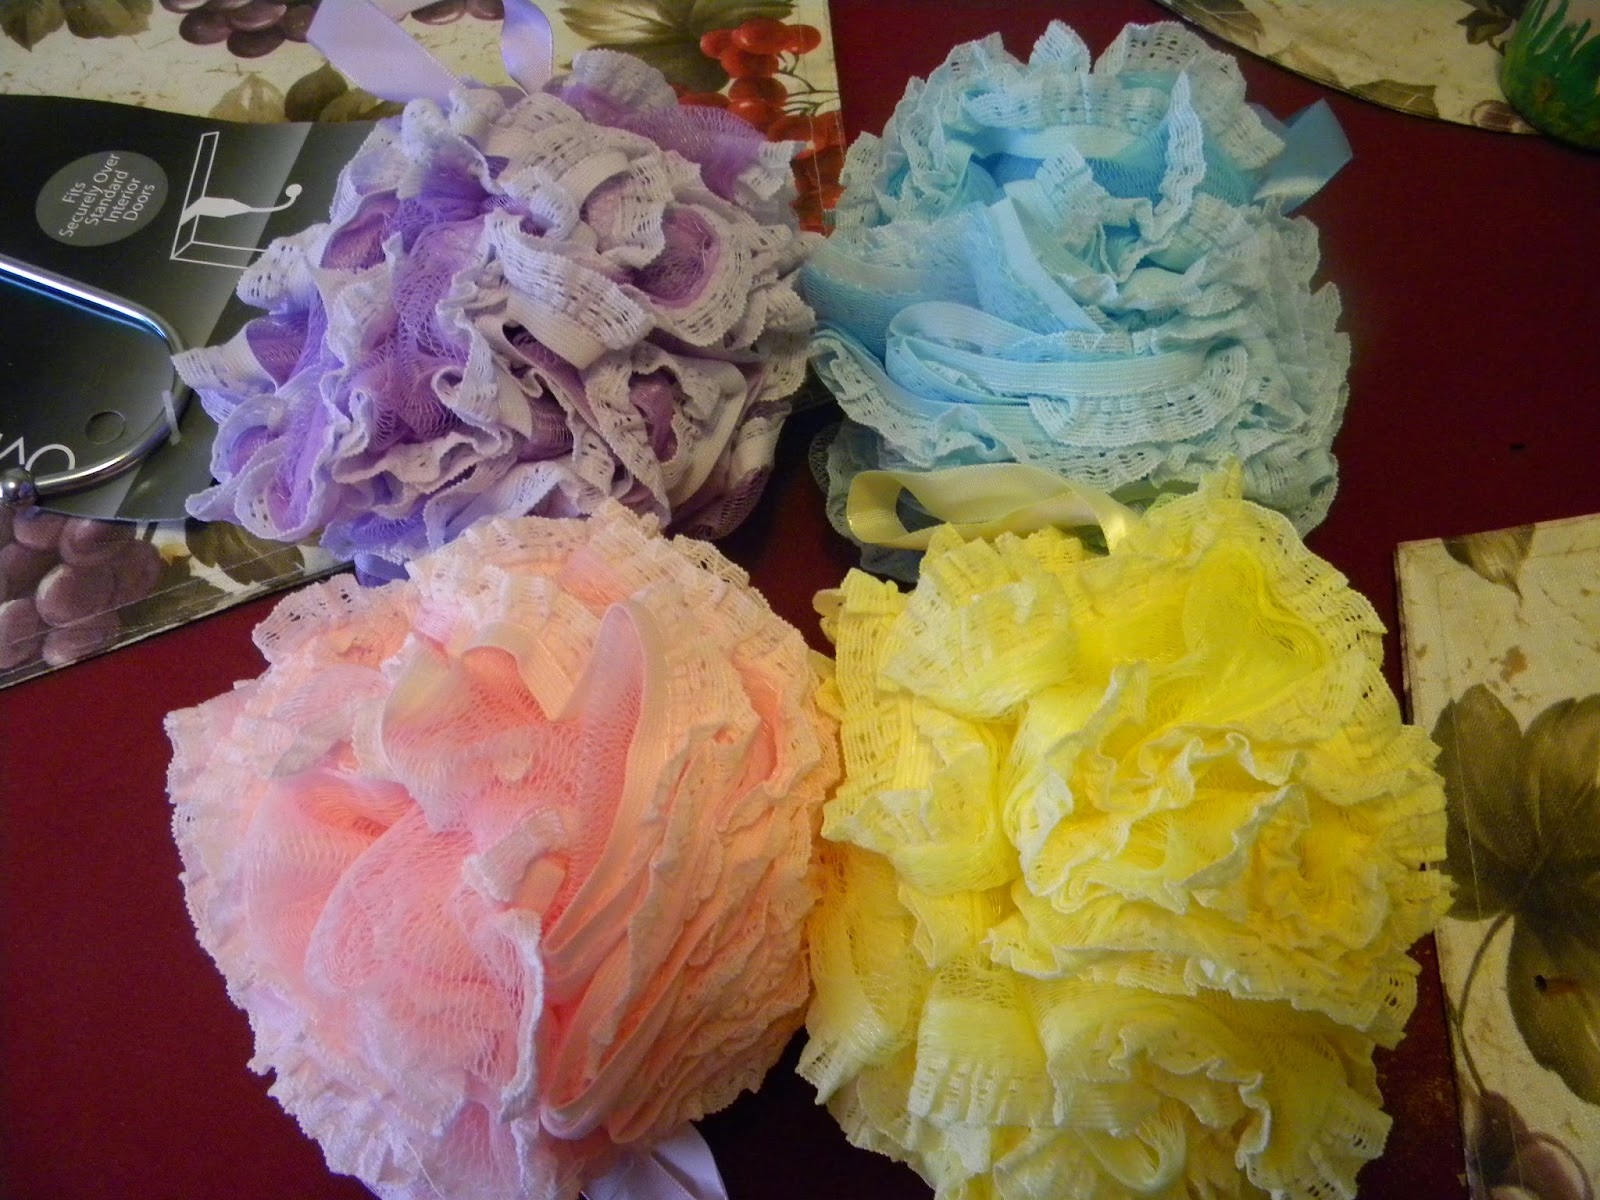 Rottiesreviewz Xl Lace Mesh Shower Poufs From Shower Bouquet